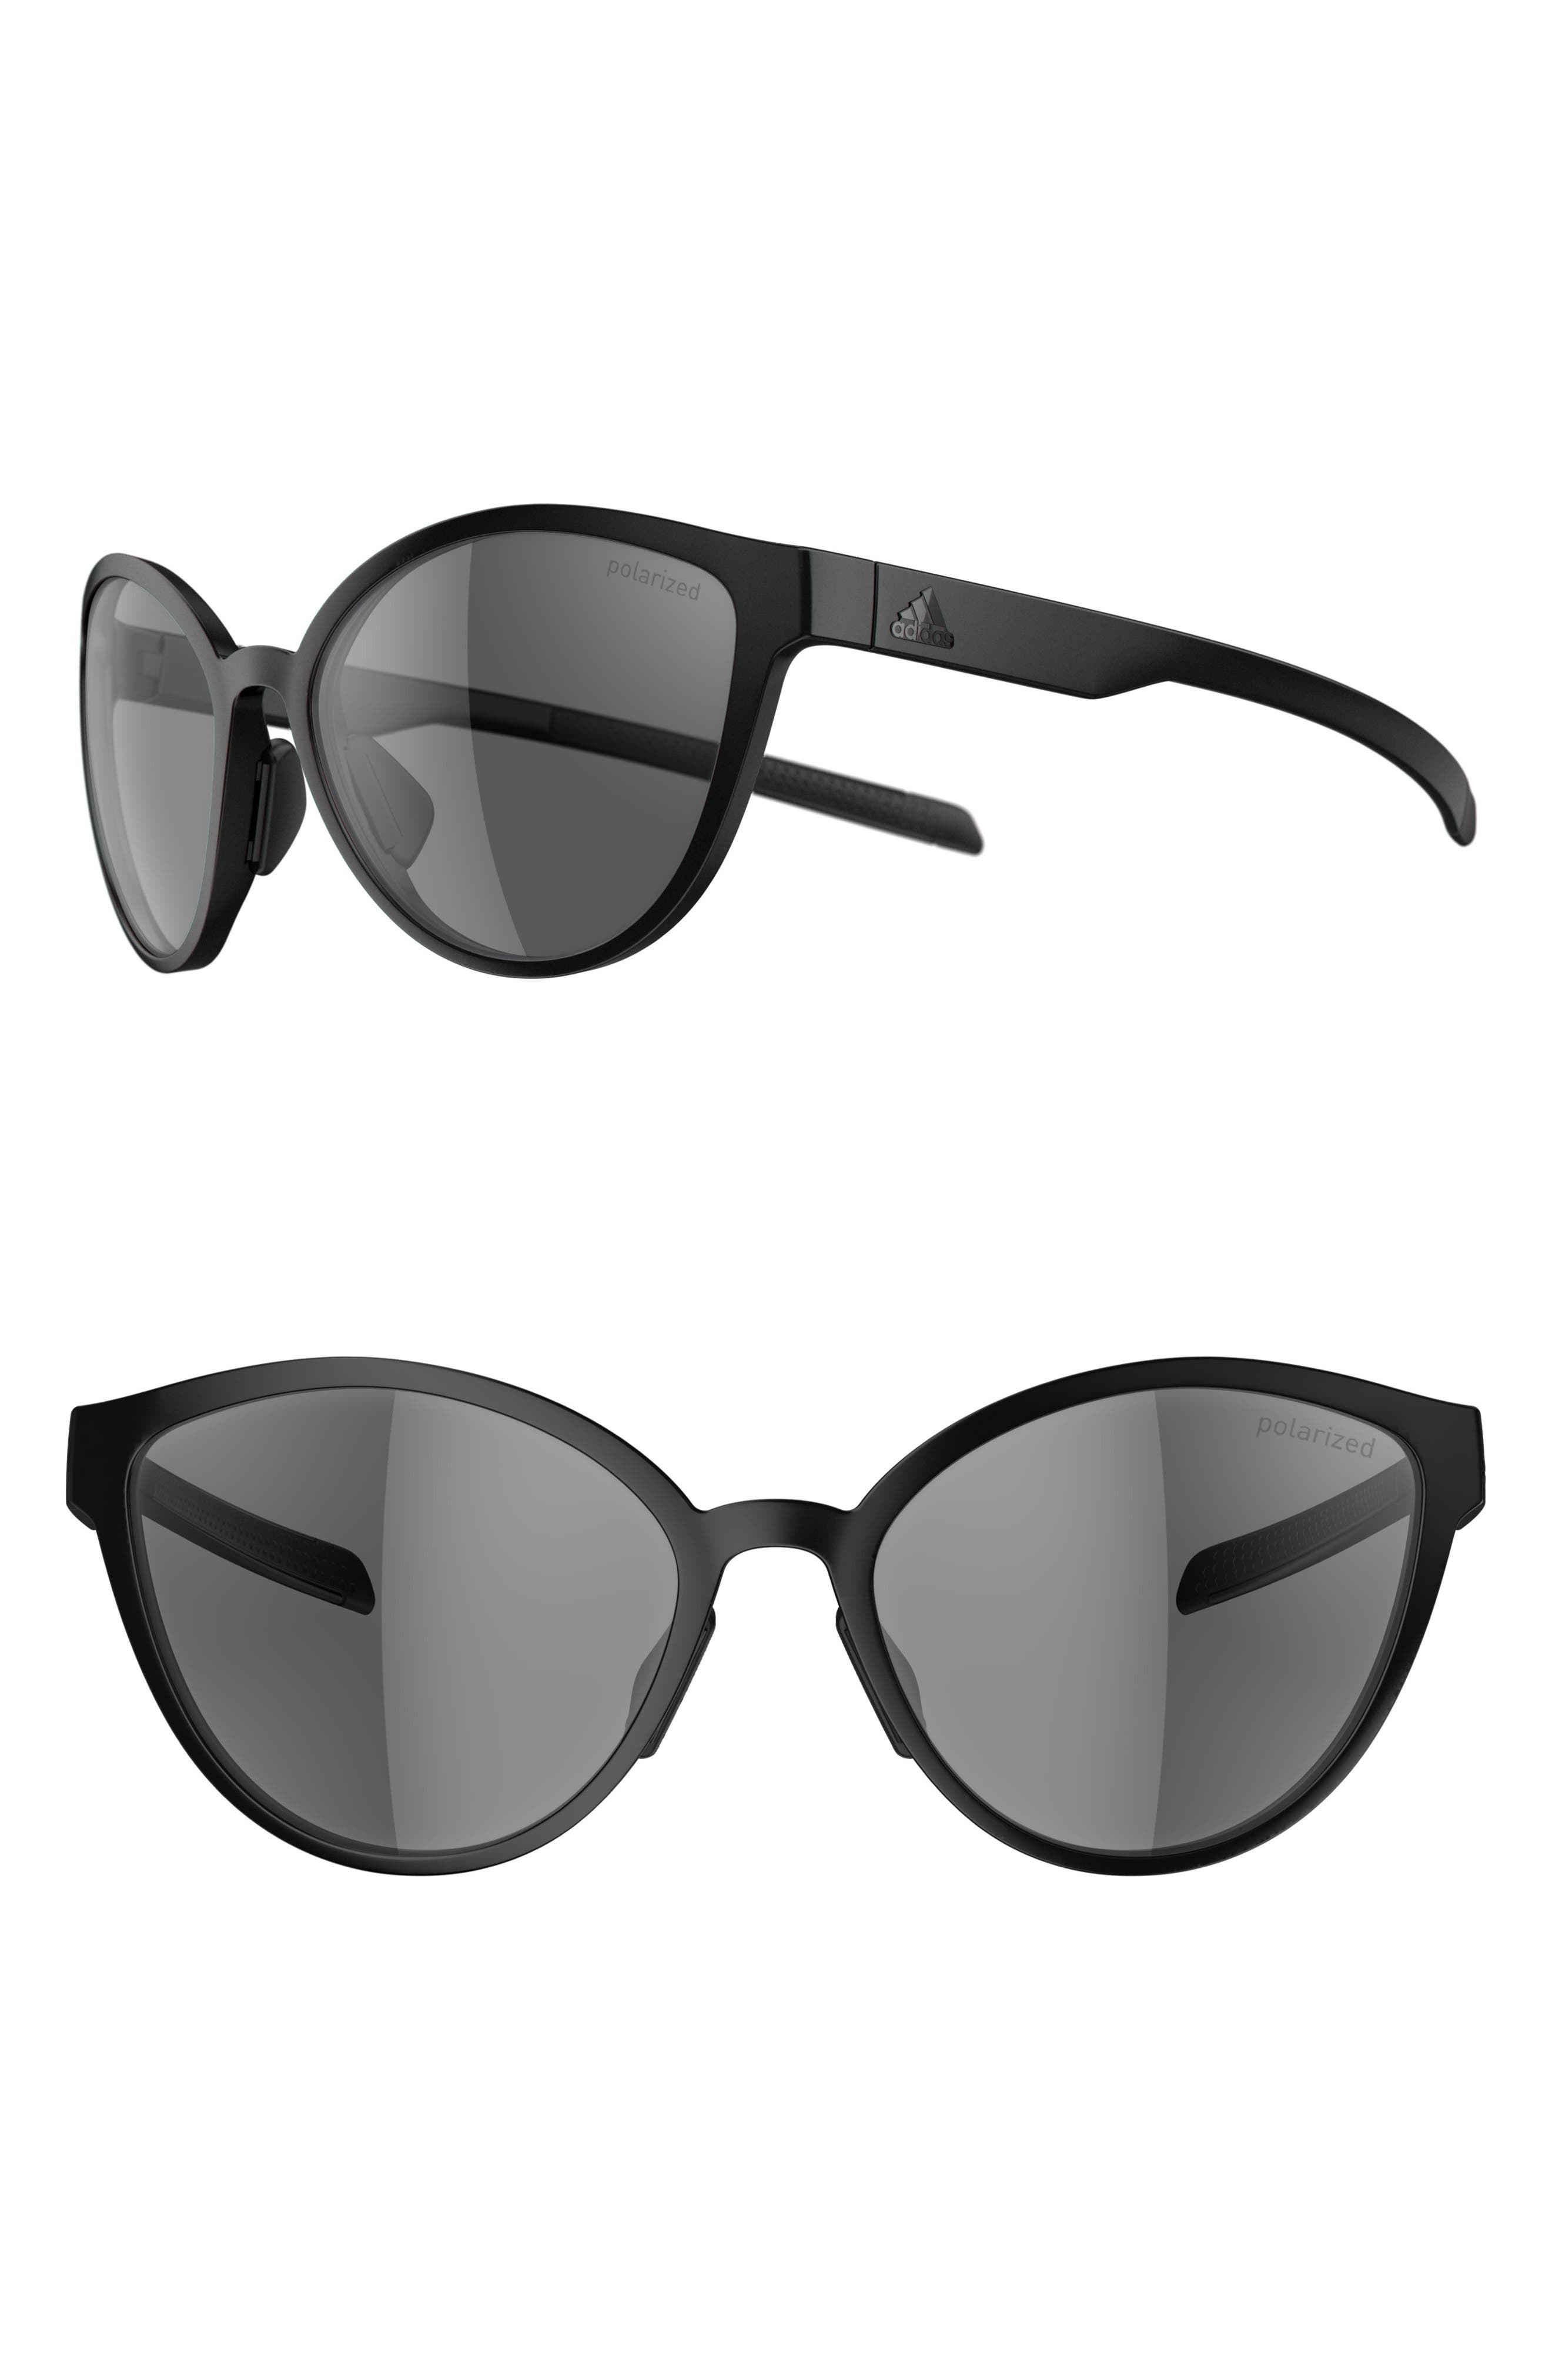 Tempest 56mm Polarized Running Sunglasses,                         Main,                         color, BLACK MATTE/ GREY